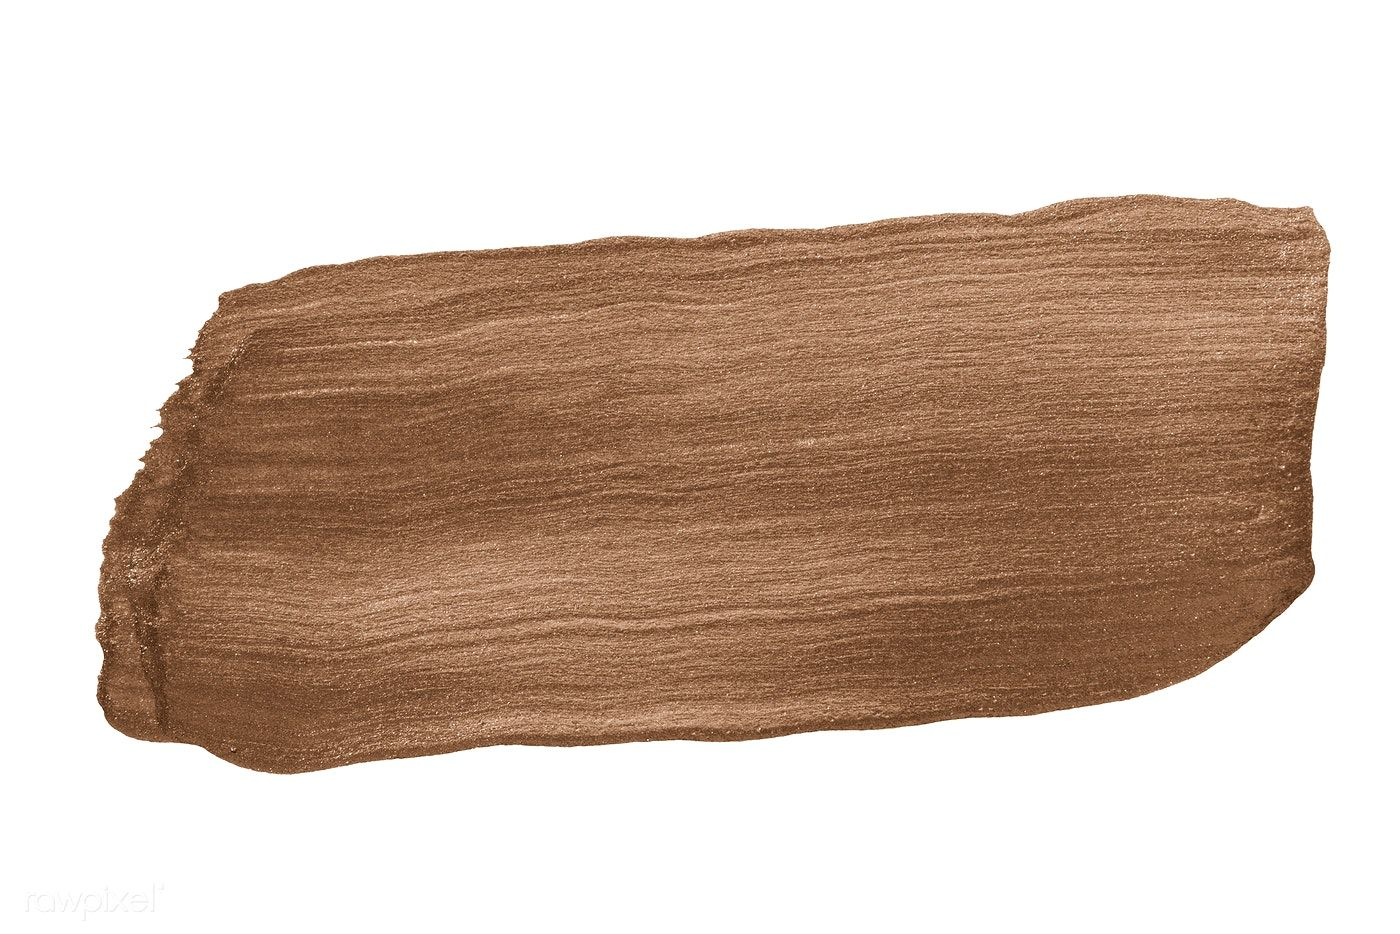 Download Premium Psd Of Festive Shimmery Brown Brush Stroke 552834 Brush Strokes Brown Aesthetic Brush Stroke Png